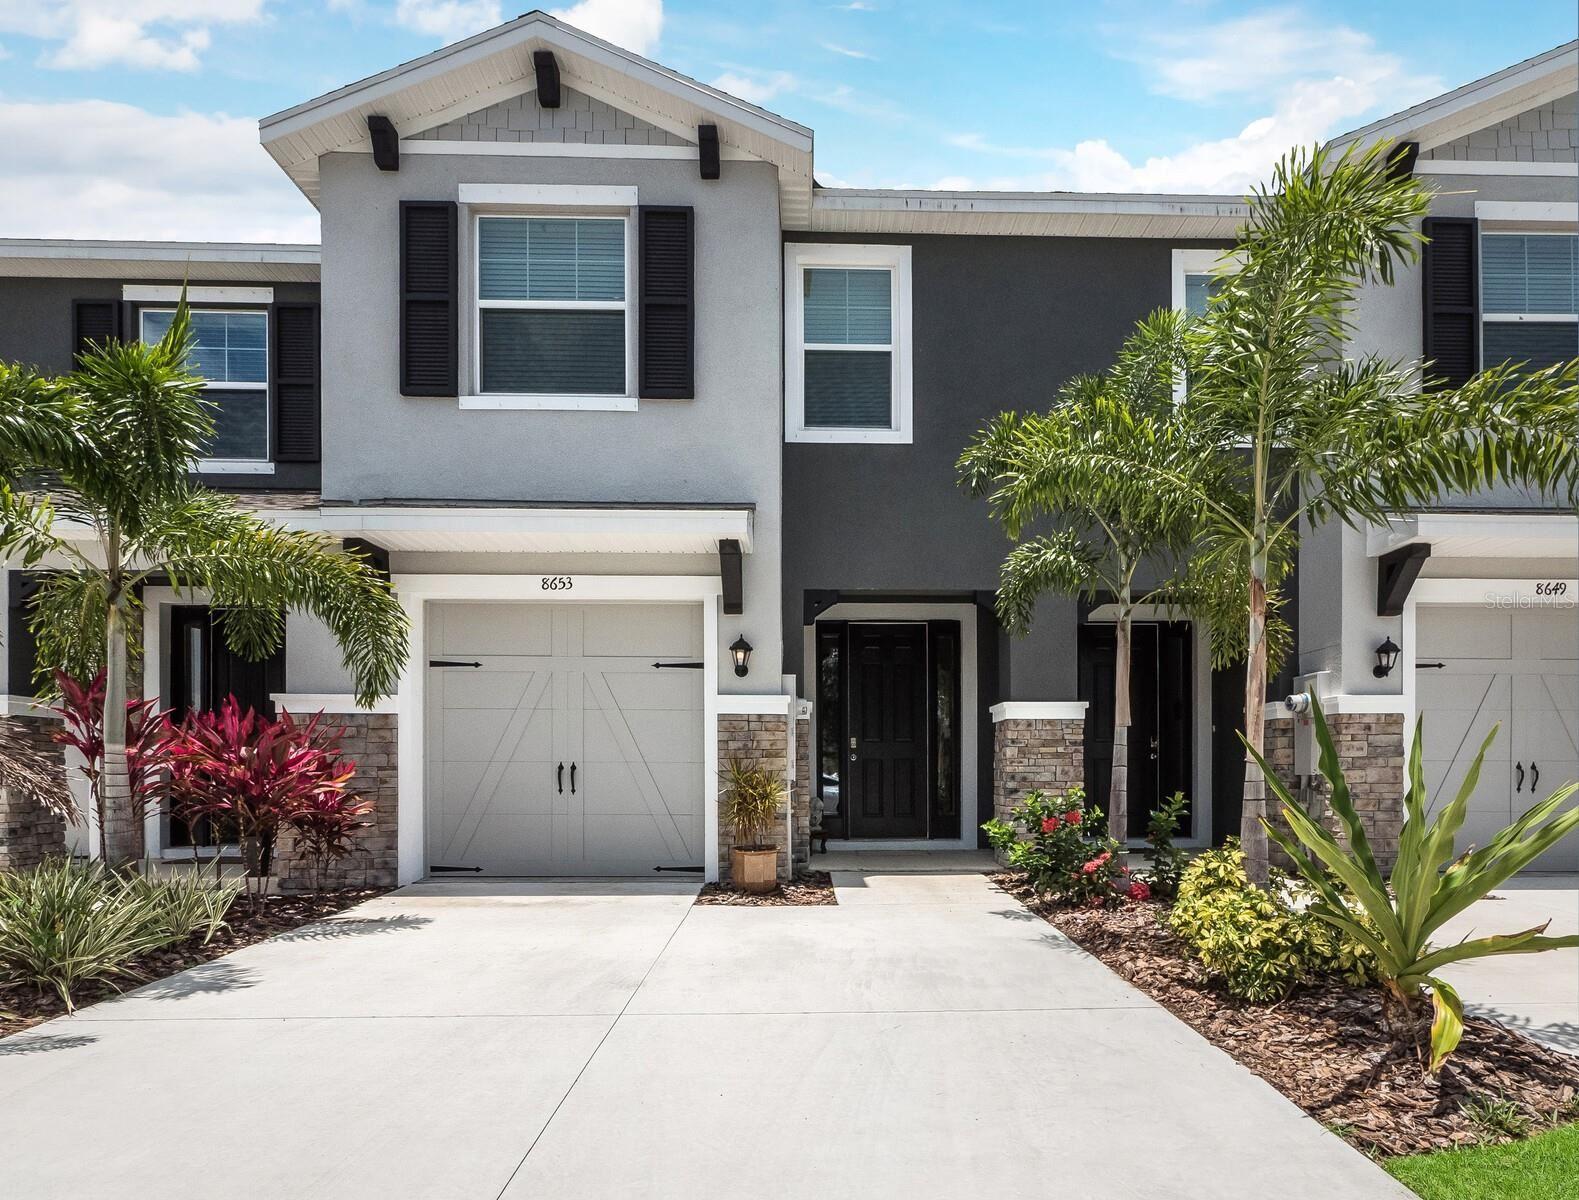 8653 DAYDREAM STREET, Sarasota, FL 34238 - #: A4504454